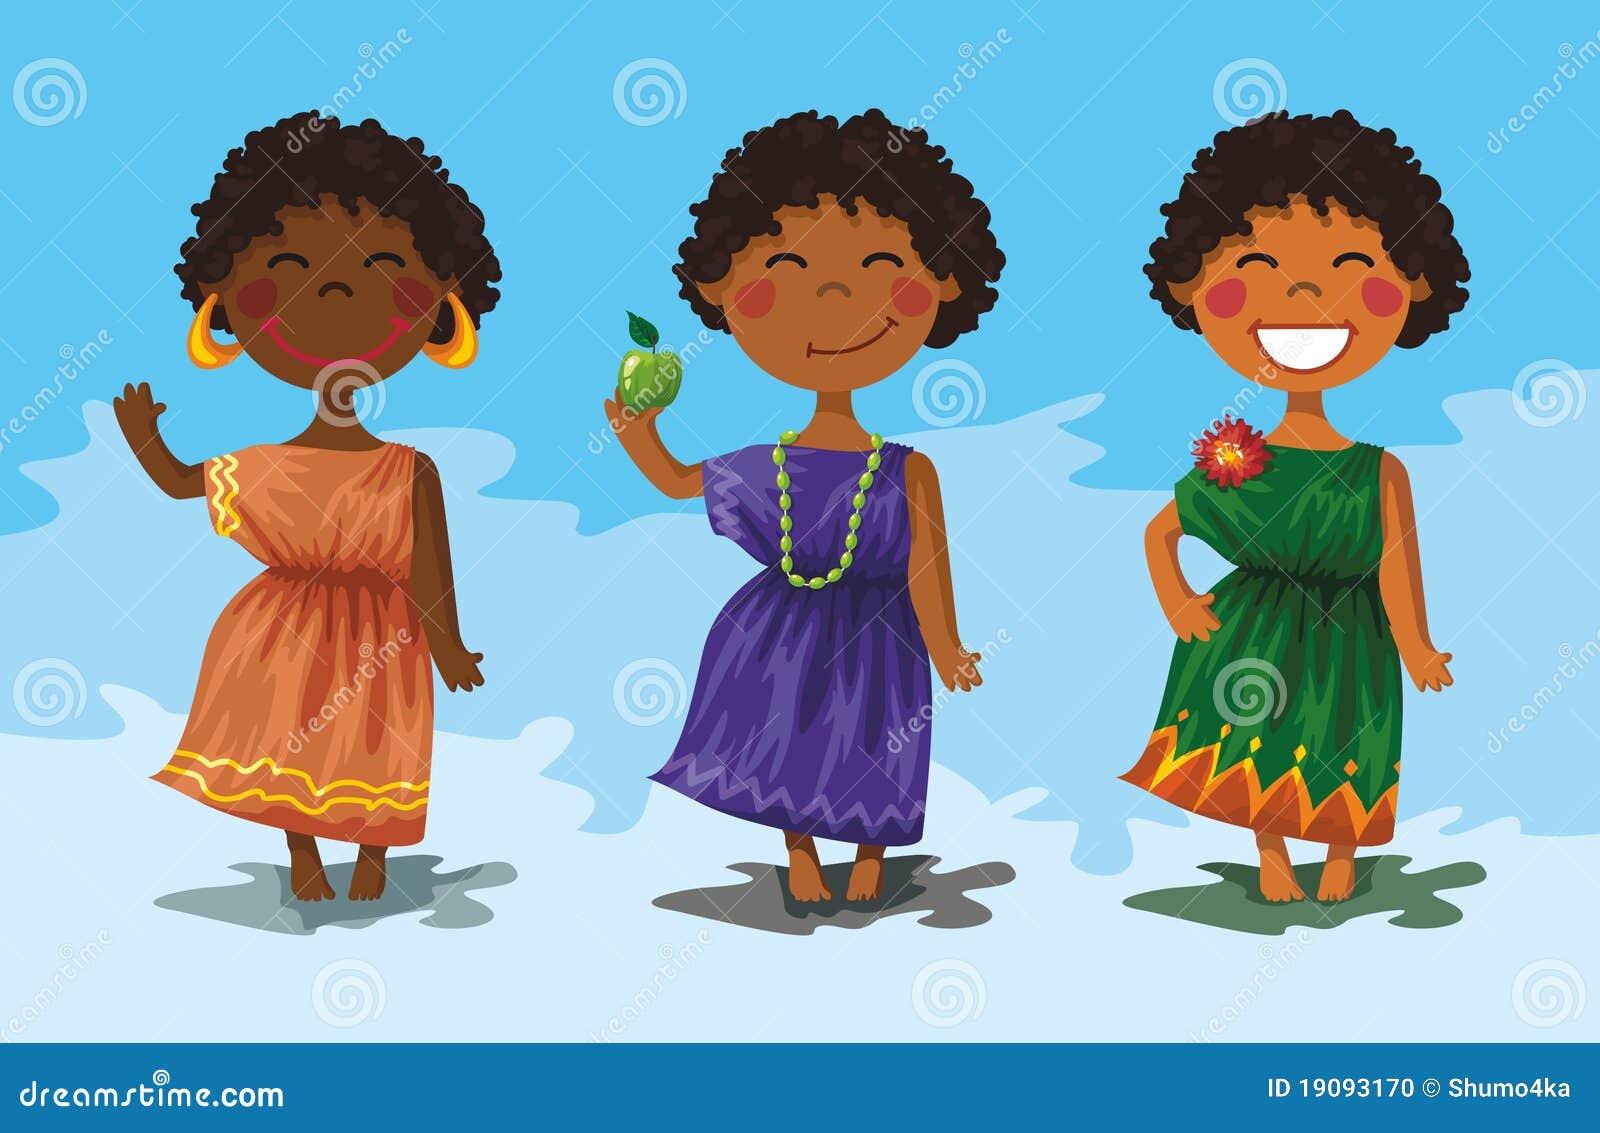 personajes de dibujos animados - muchachas africanas lindas. muchachas